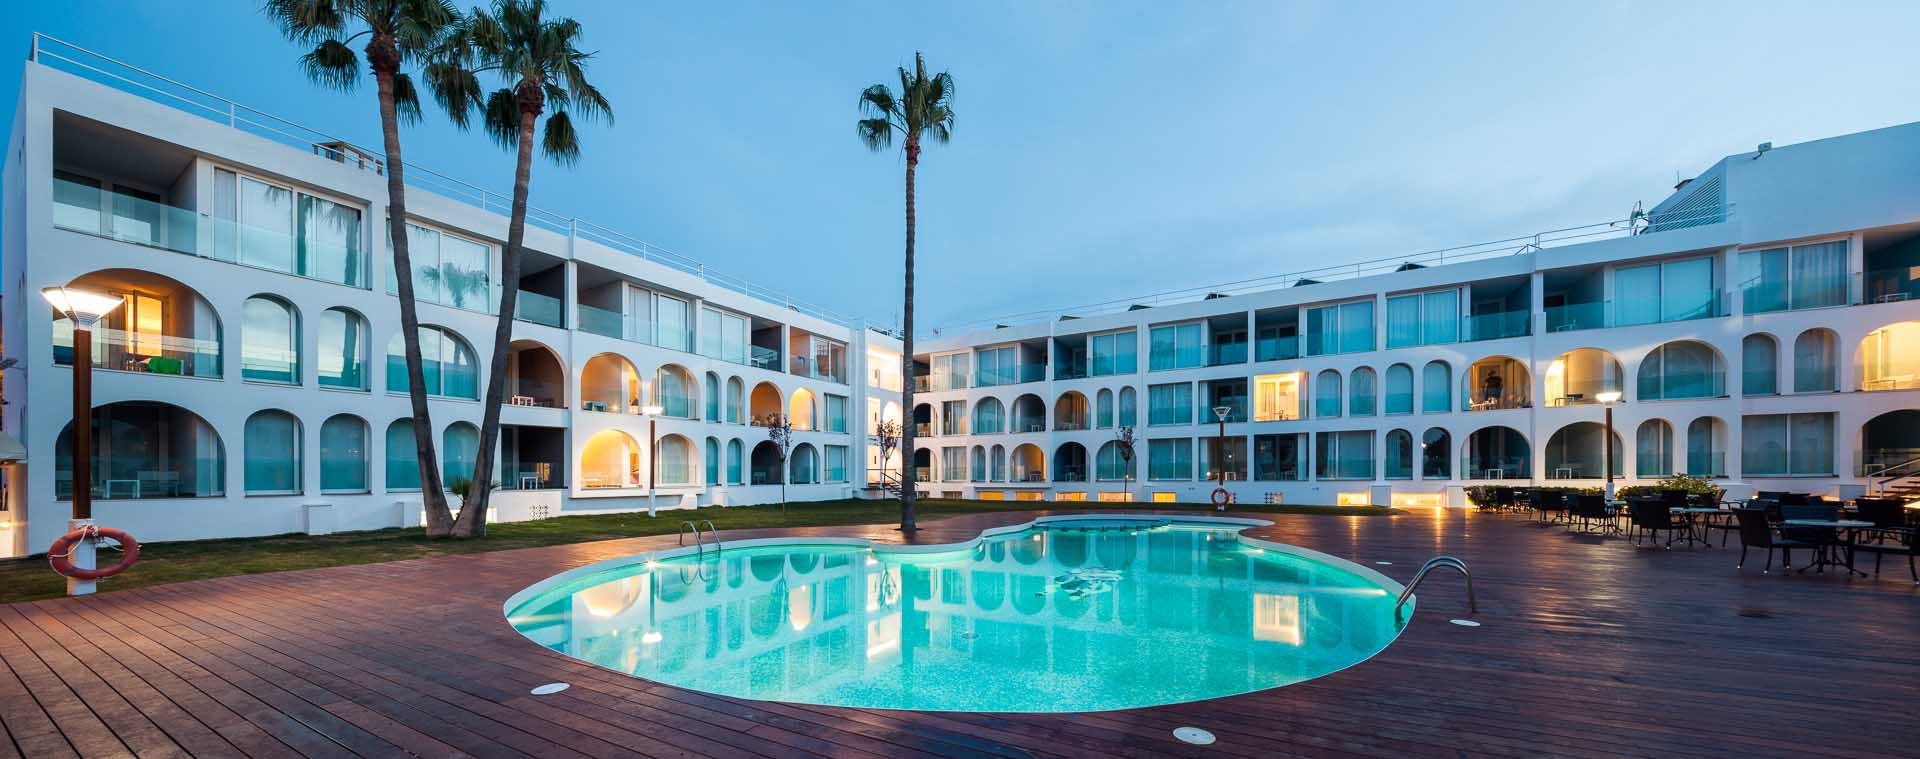 Lavabo Meridian Compacto.Mixis Arquitectos Hotel Ebano Divisare